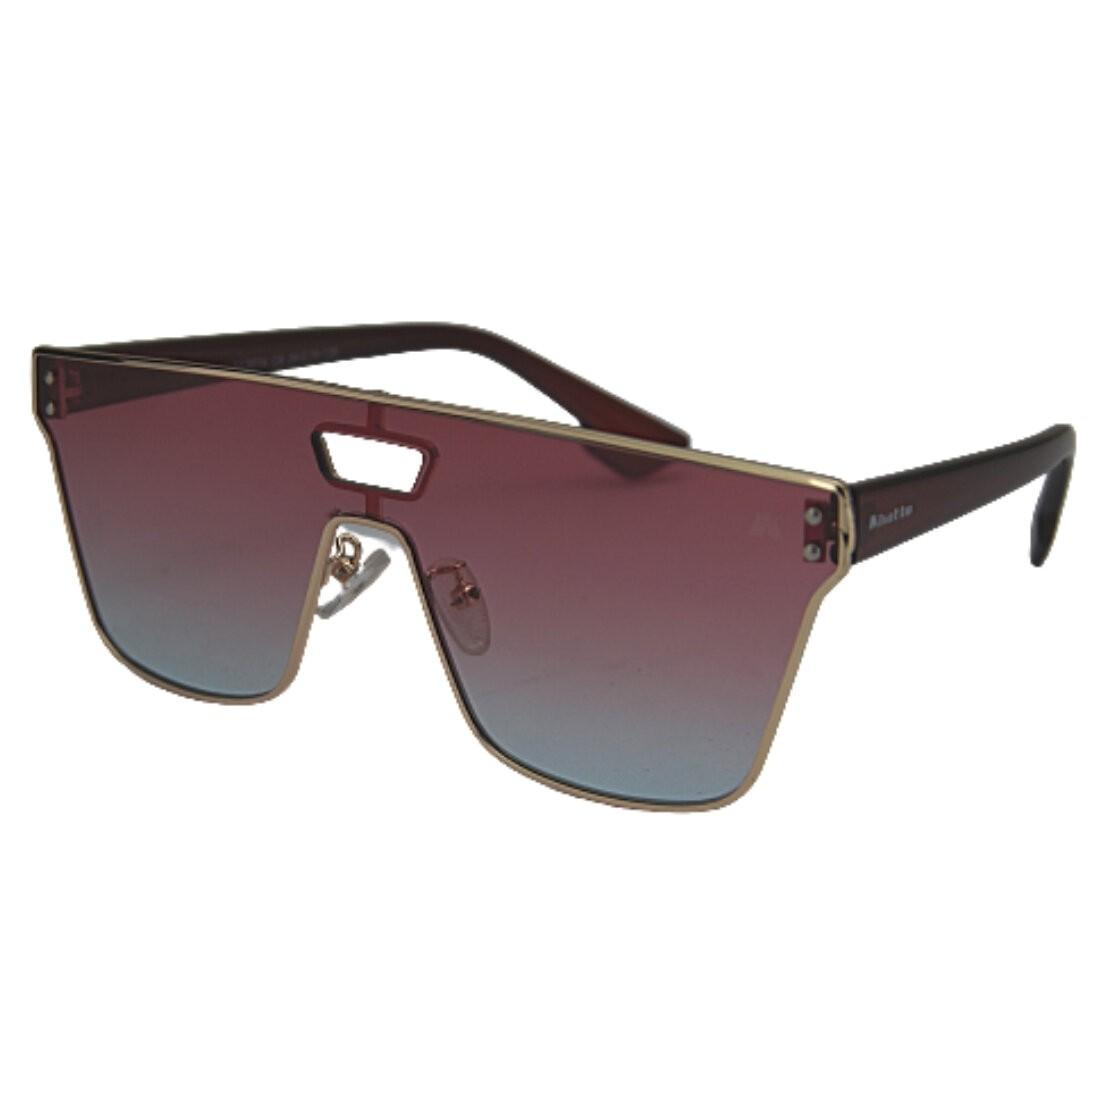 OUTLET - Óculos de Sol Khatto Square Pretty - Azul e Rosa